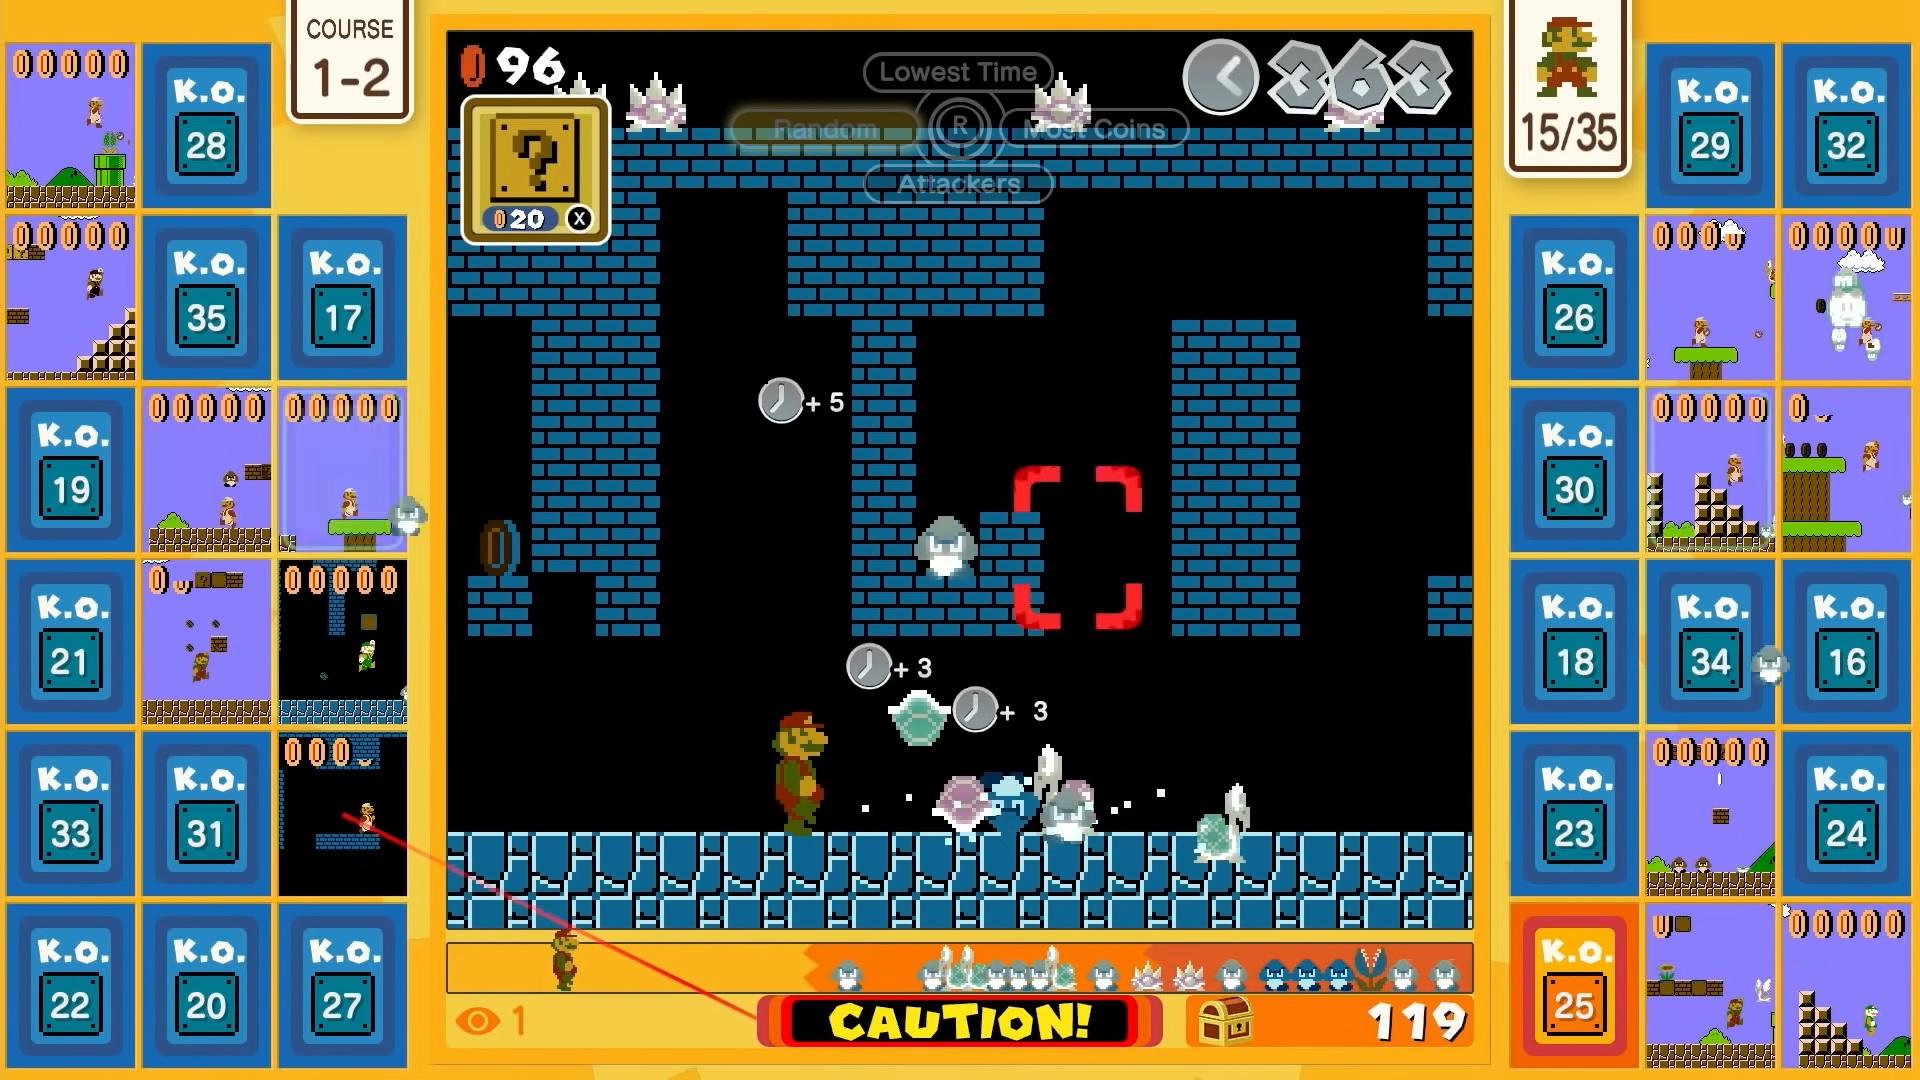 Super Mario Bros 35 Halloween Event Begins This Week - Siliconera